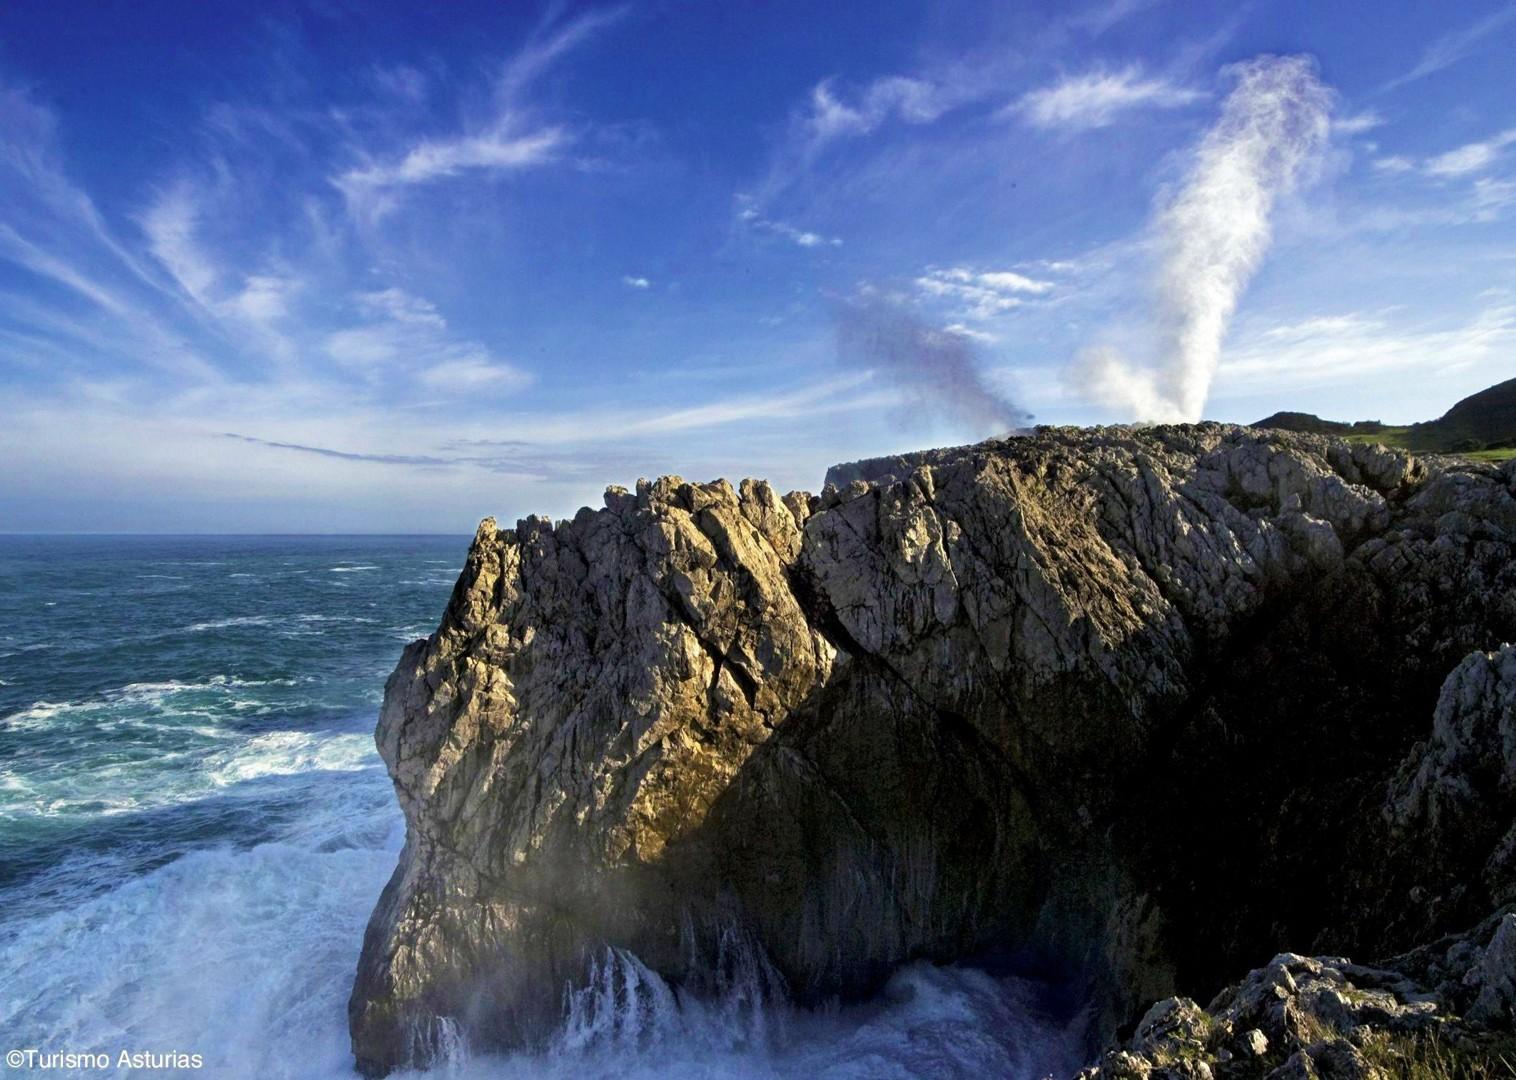 _Holiday.616.17853.jpg - Spain - Asturian Coastal Ride - Guided Family Cycling Holiday - Family Cycling